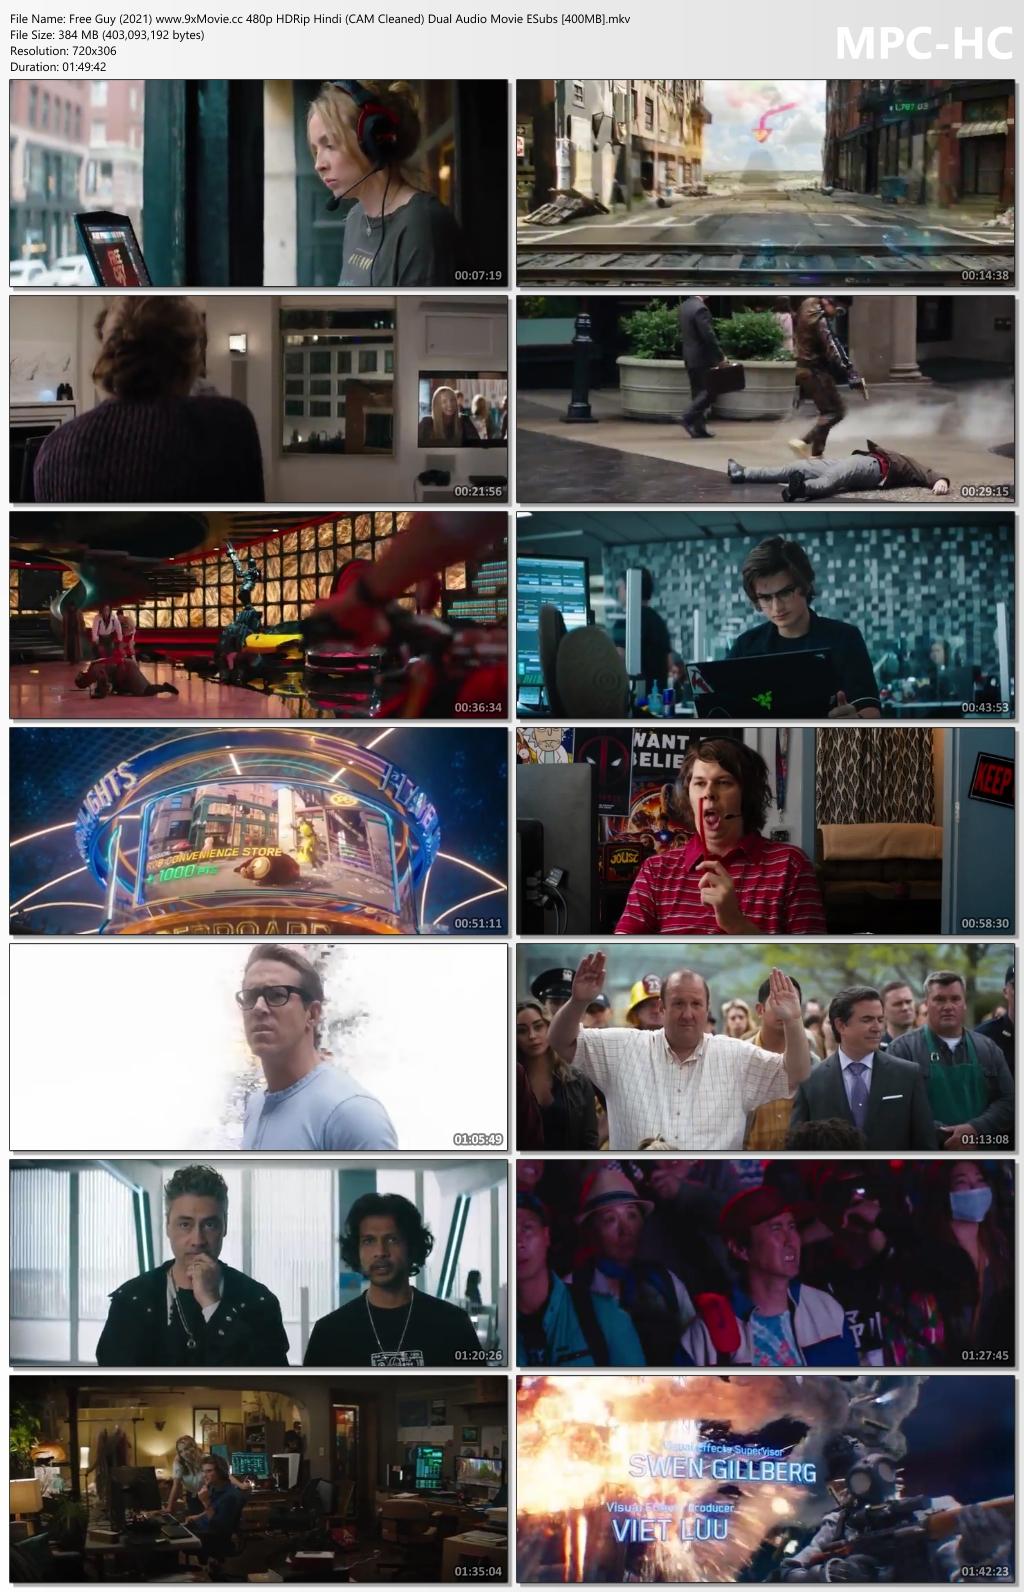 Free-Guy-2021-www-9x-Movie-cc-480p-HDRip-Hindi-CAM-Cleaned-Dual-Audio-Movie-ESubs-400-MB-mkv